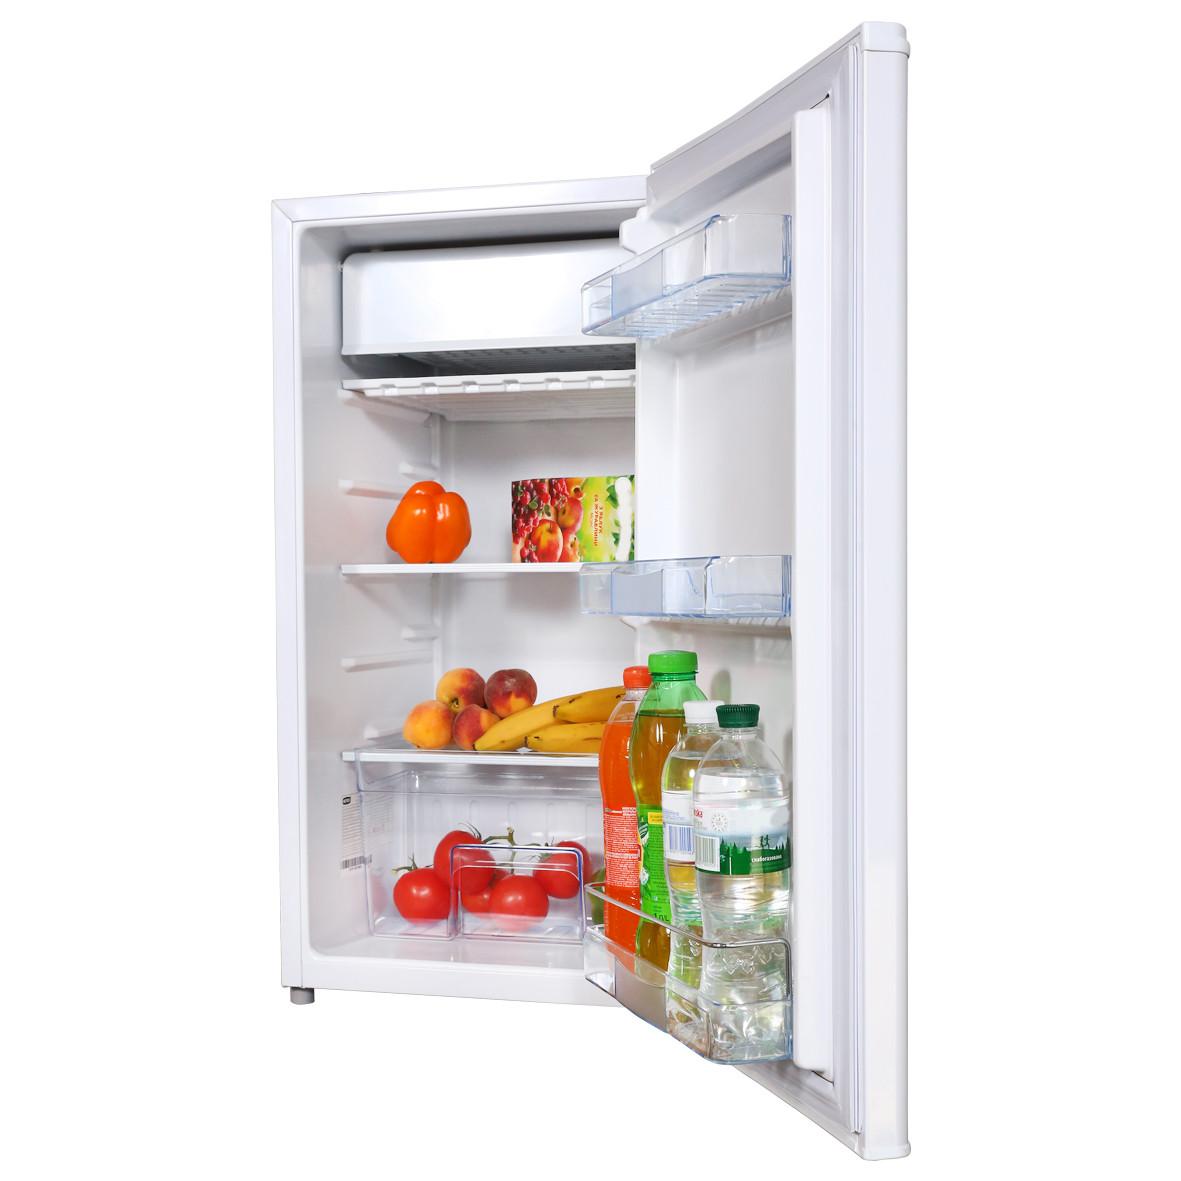 Холодильник Rotex RR-SD100 (Ротекс)